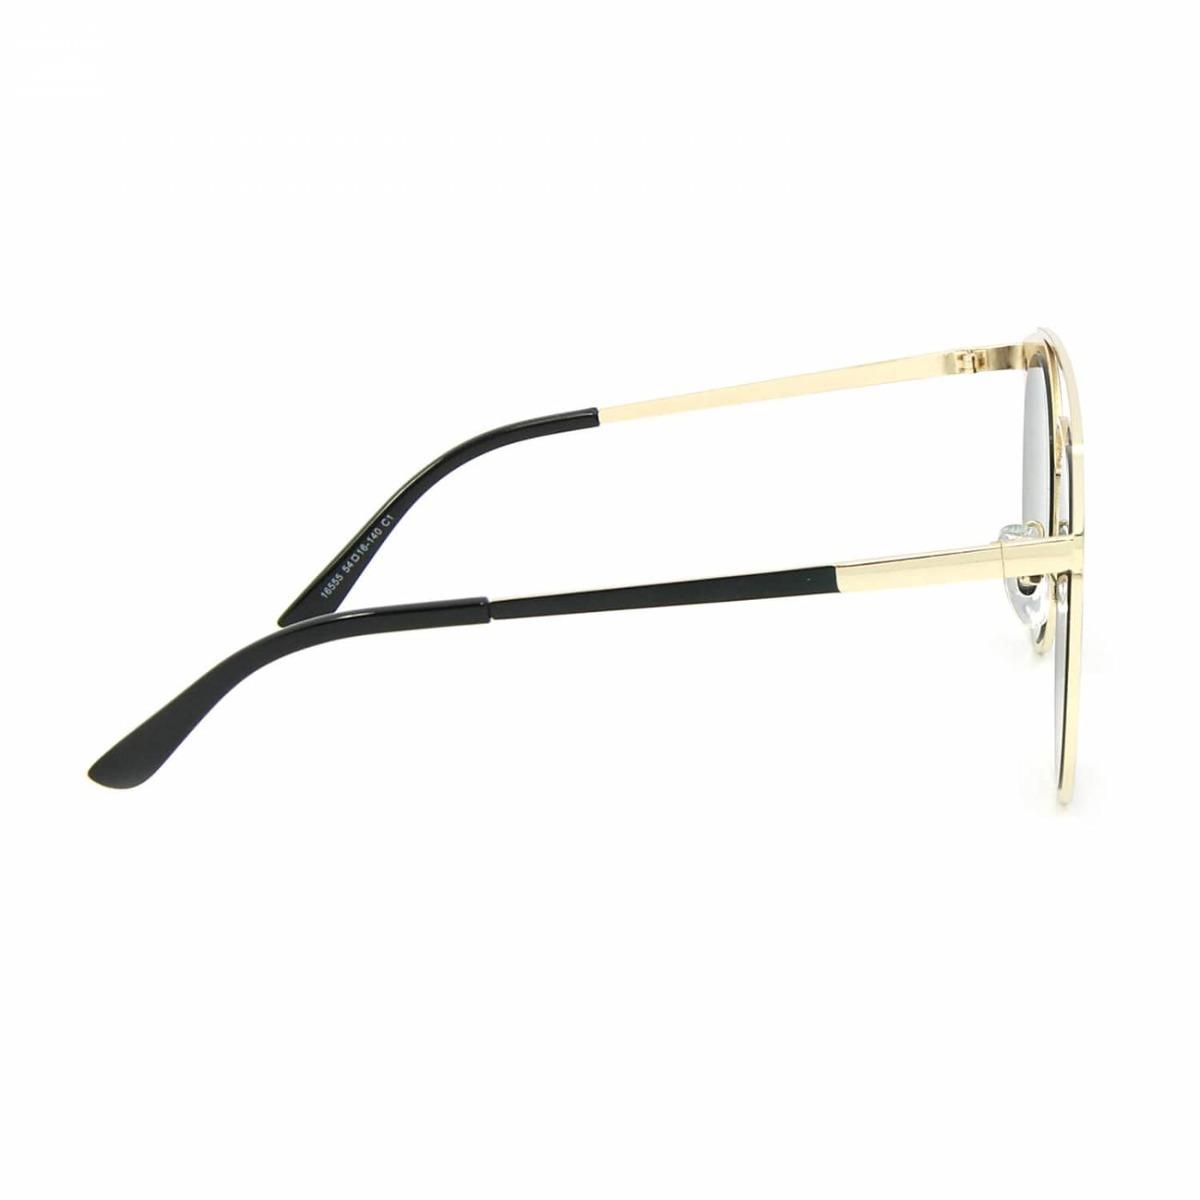 b301989a55a0a óculos de sol top bar redondo preto. Carregando zoom.